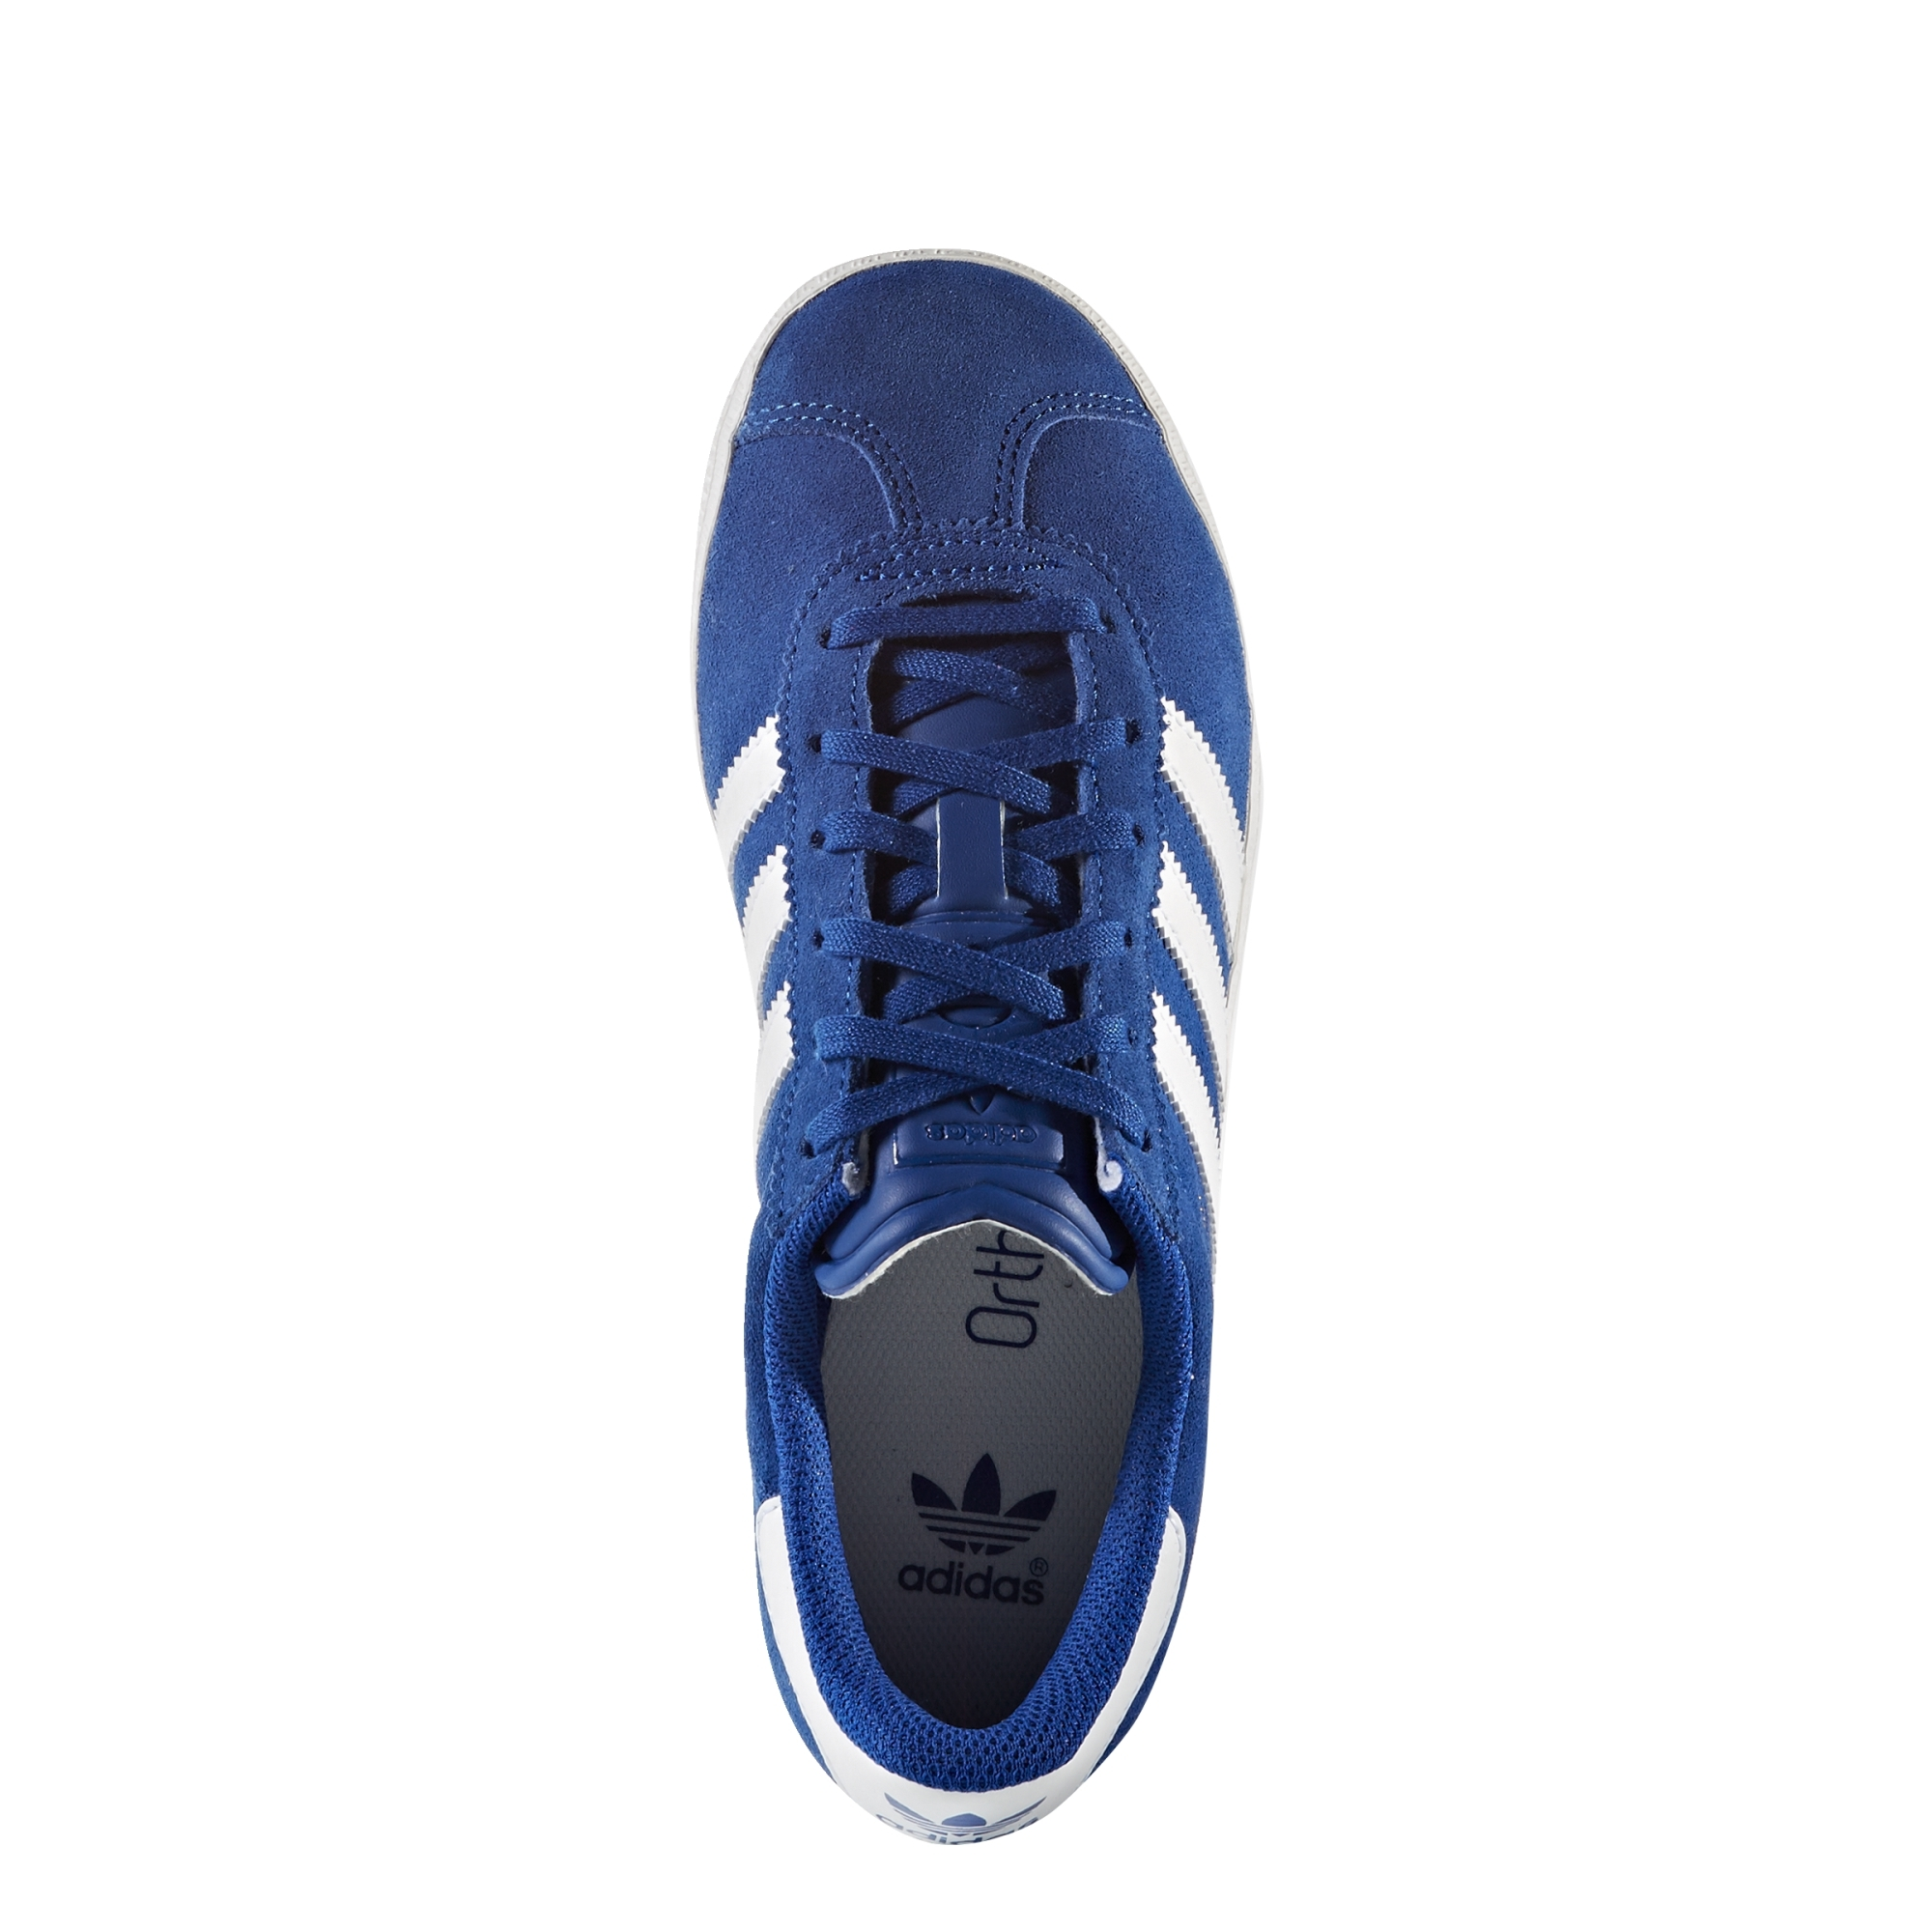 buty adidas originals gazelle 2 j